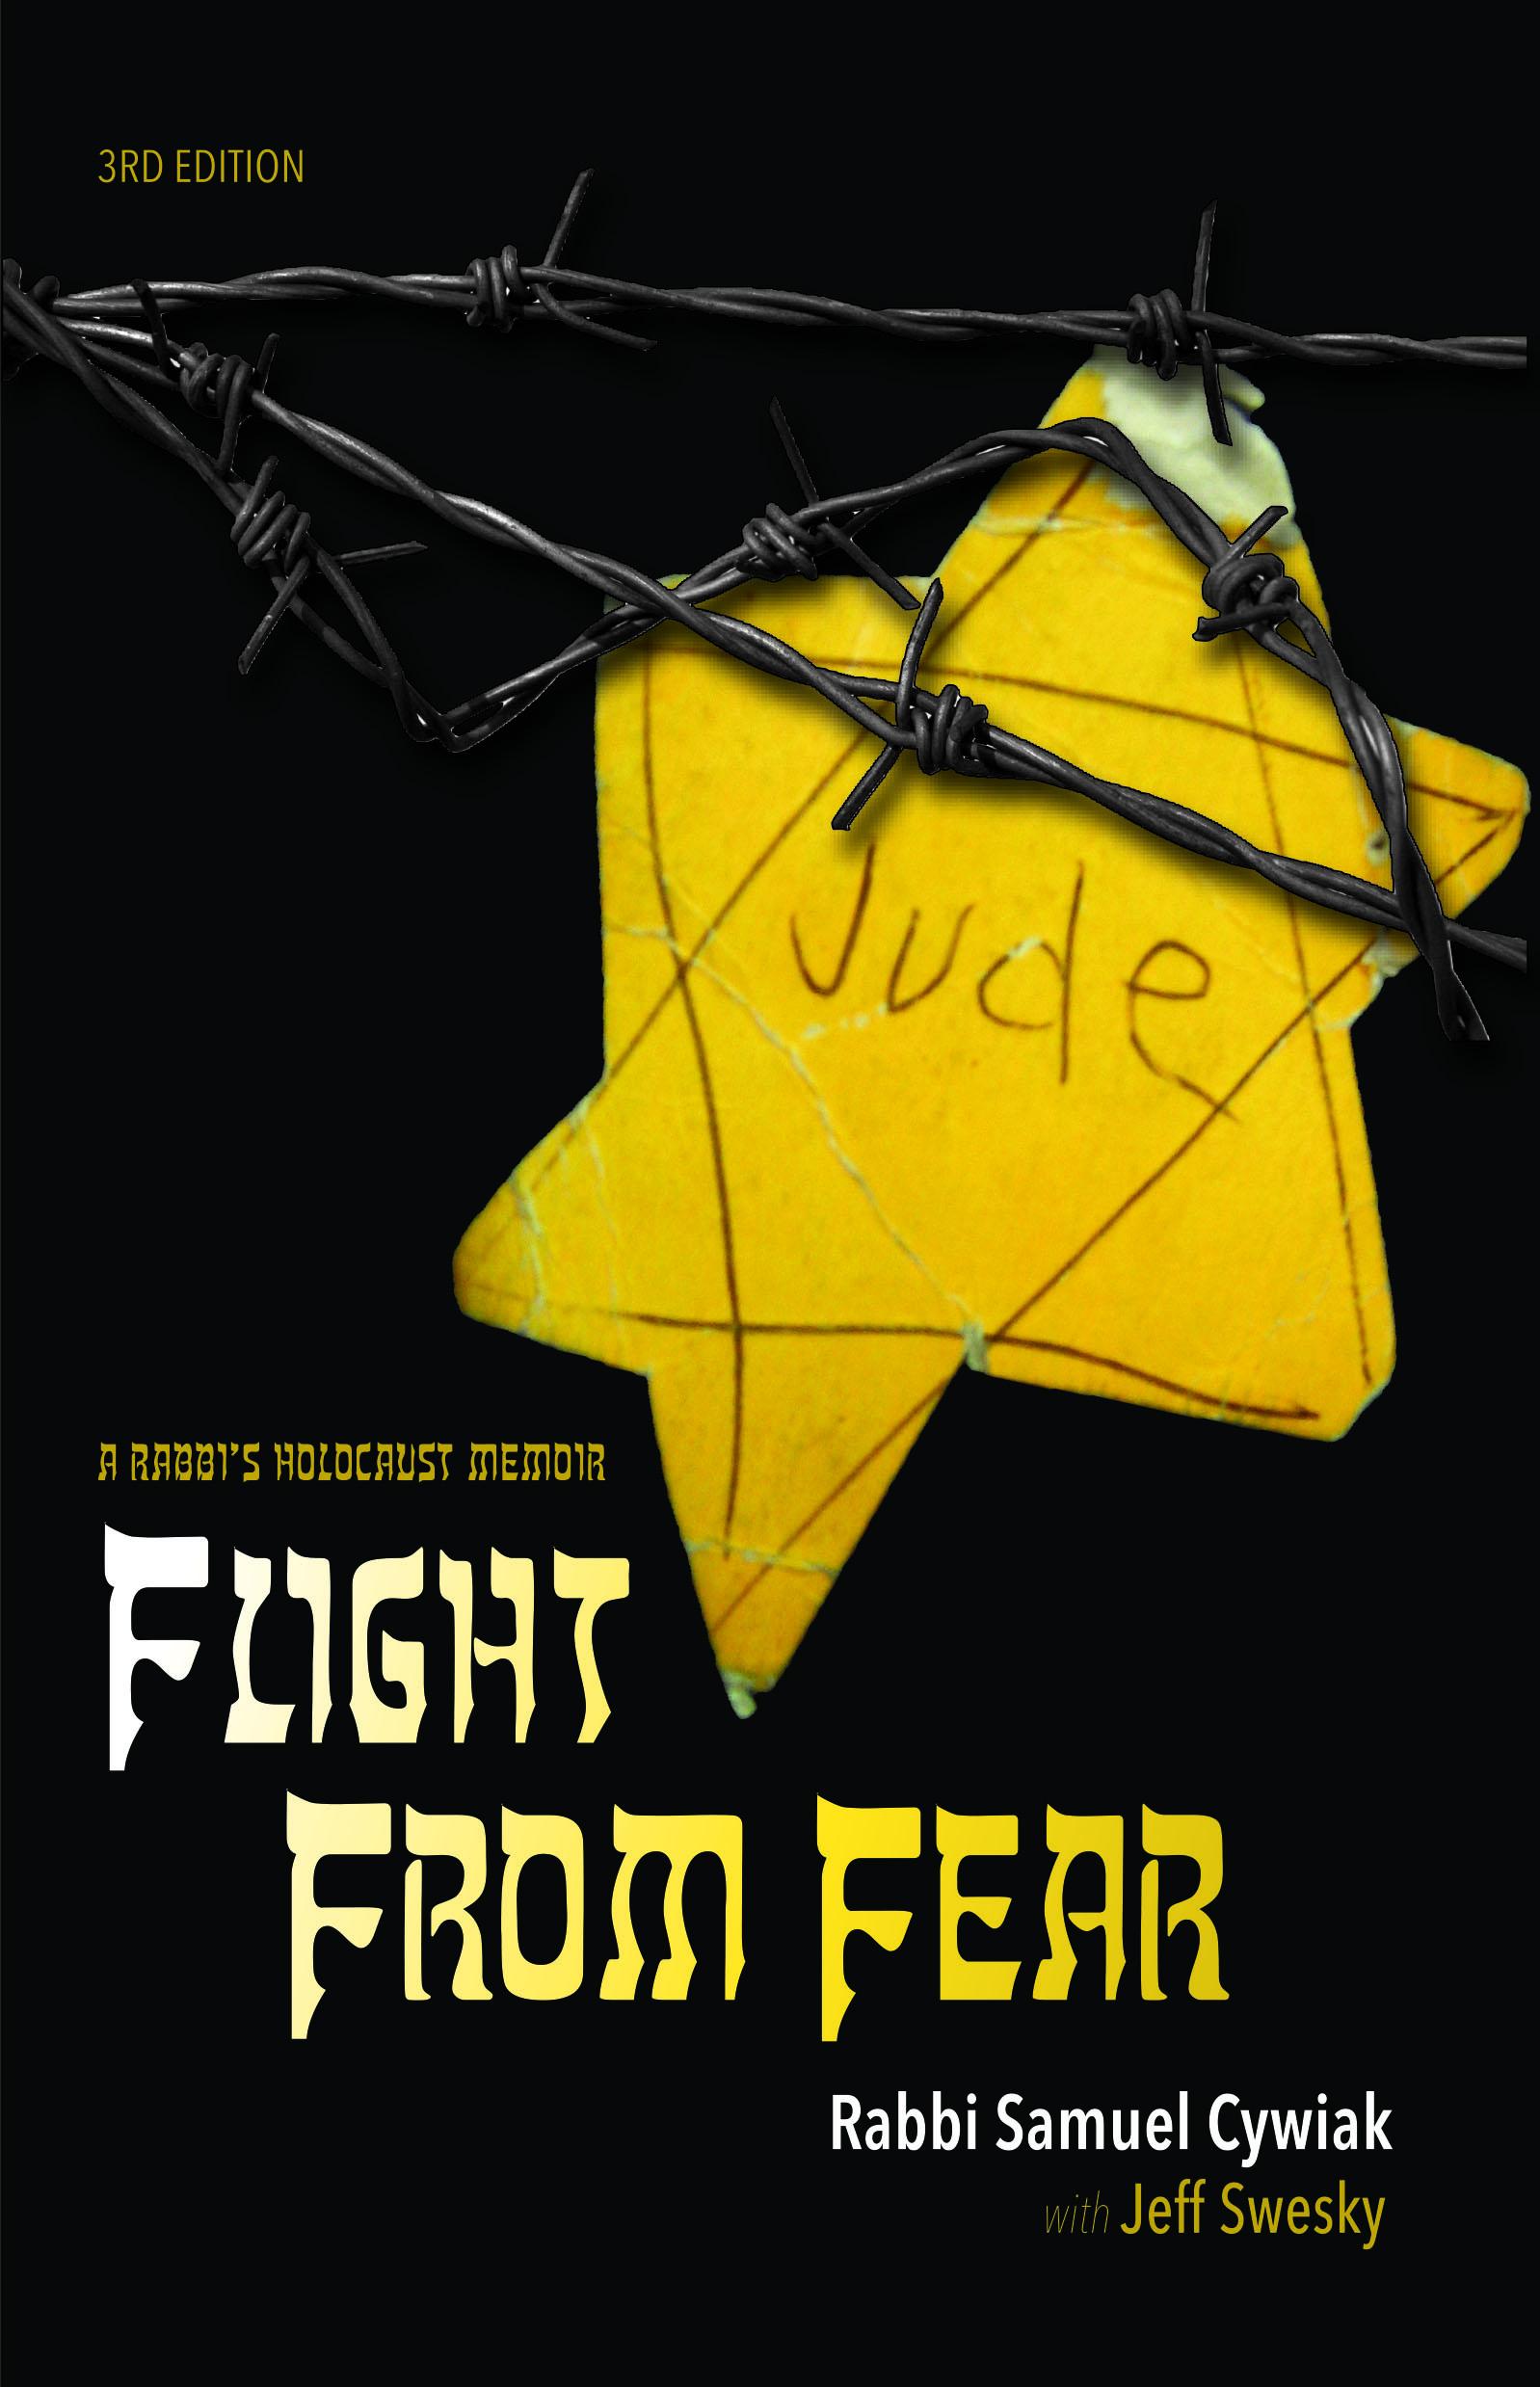 Flight from Fear: A Rabbi's Holocaust Memoir (3rd Edition)